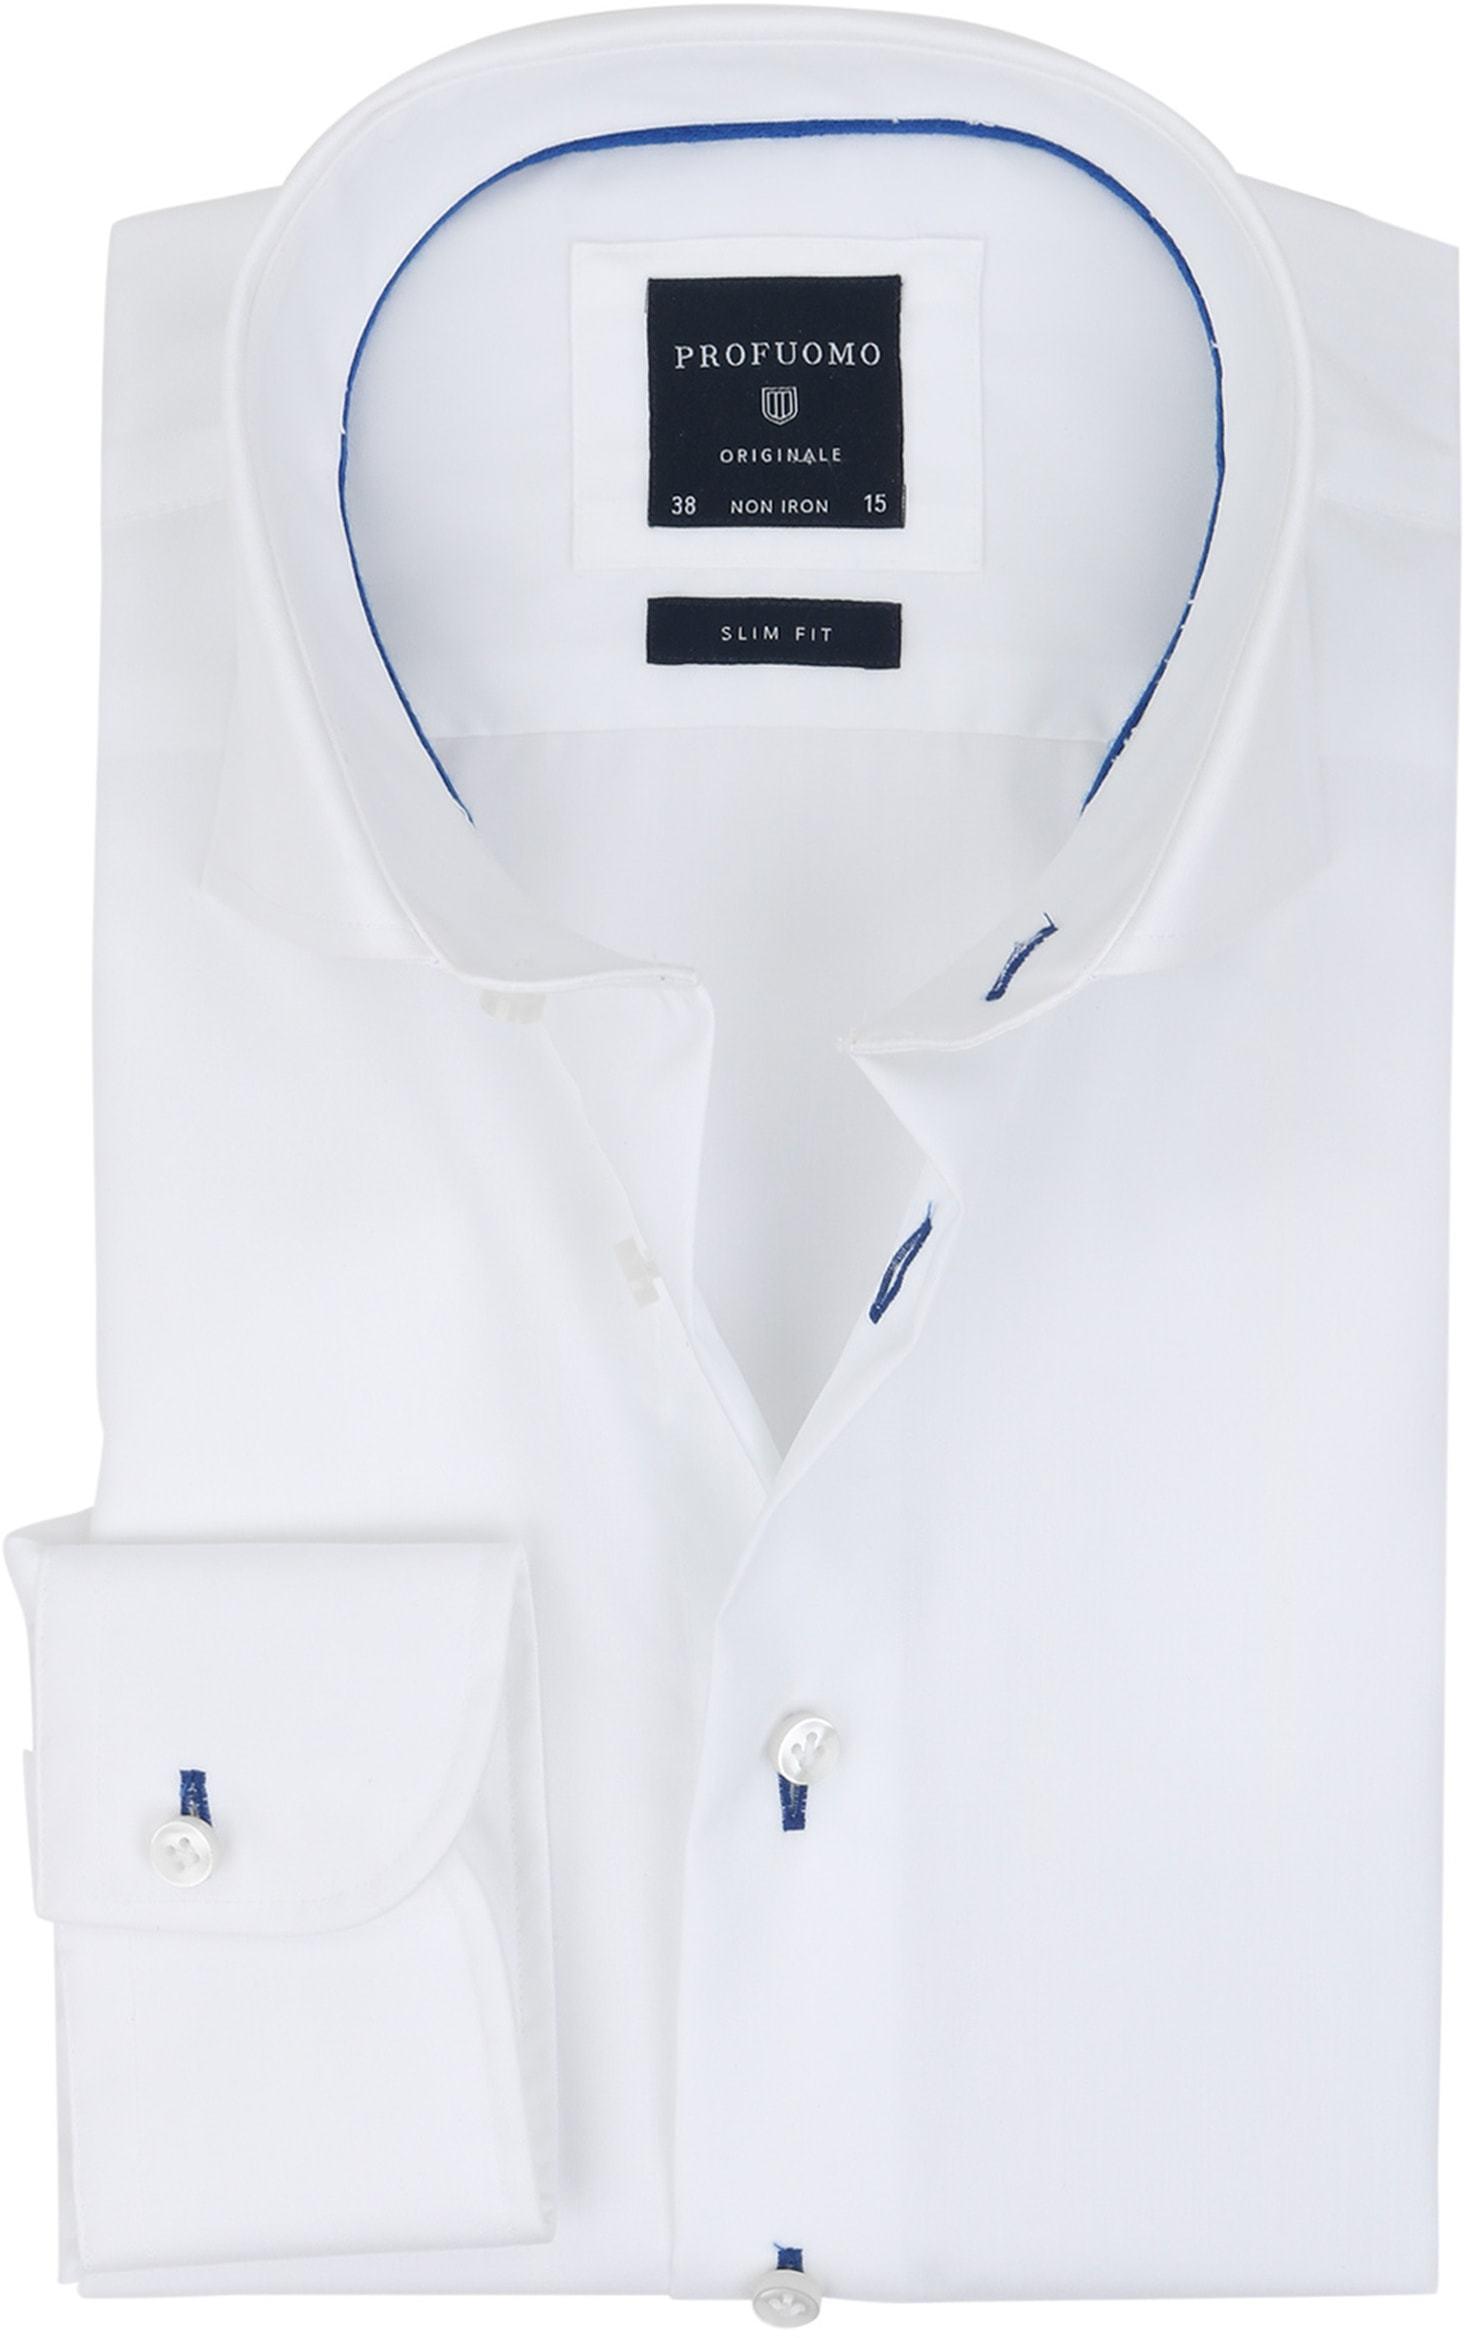 Profuomo Slim Fit Overhemd Wit Non Iron foto 0